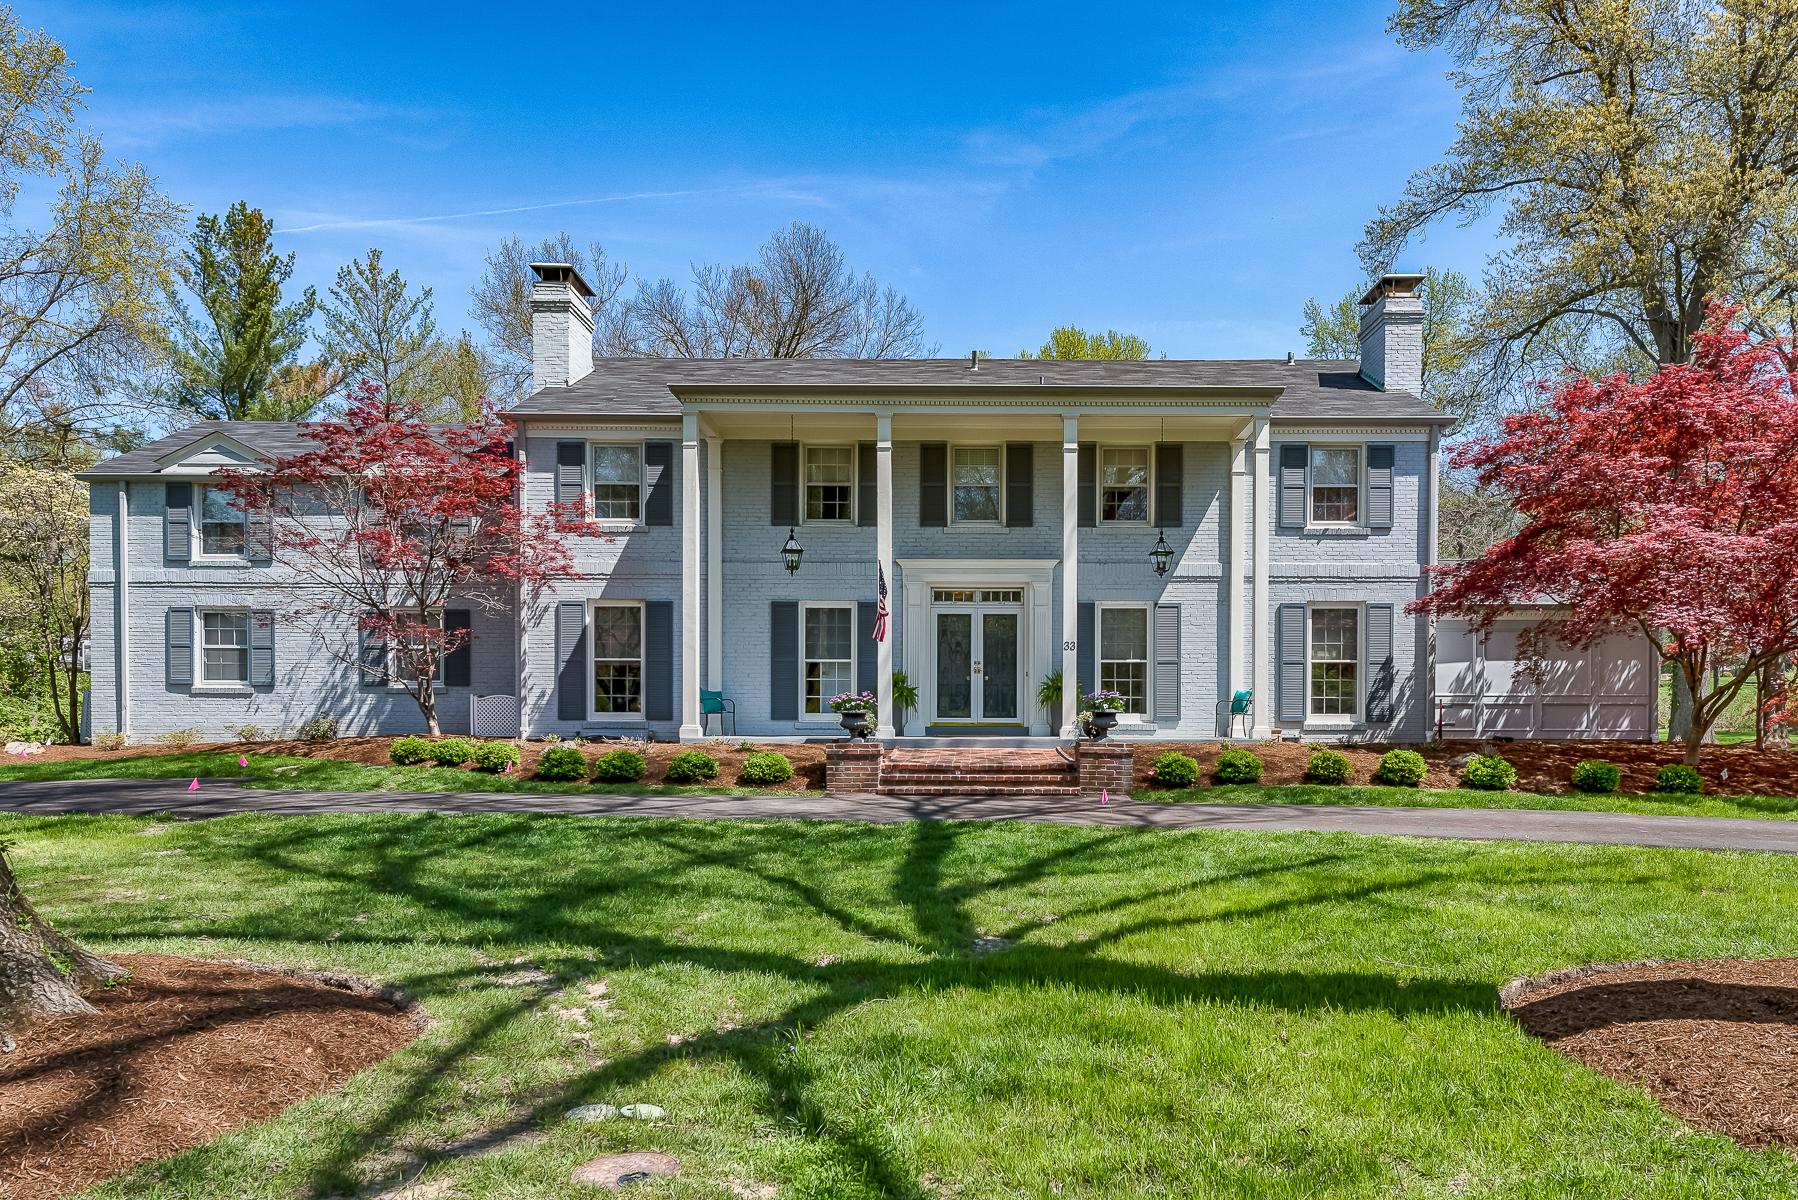 獨棟家庭住宅 為 出售 在 Log Cabin Drive 33 Log Cabin Dr Ladue, 密蘇里州, 63124 美國